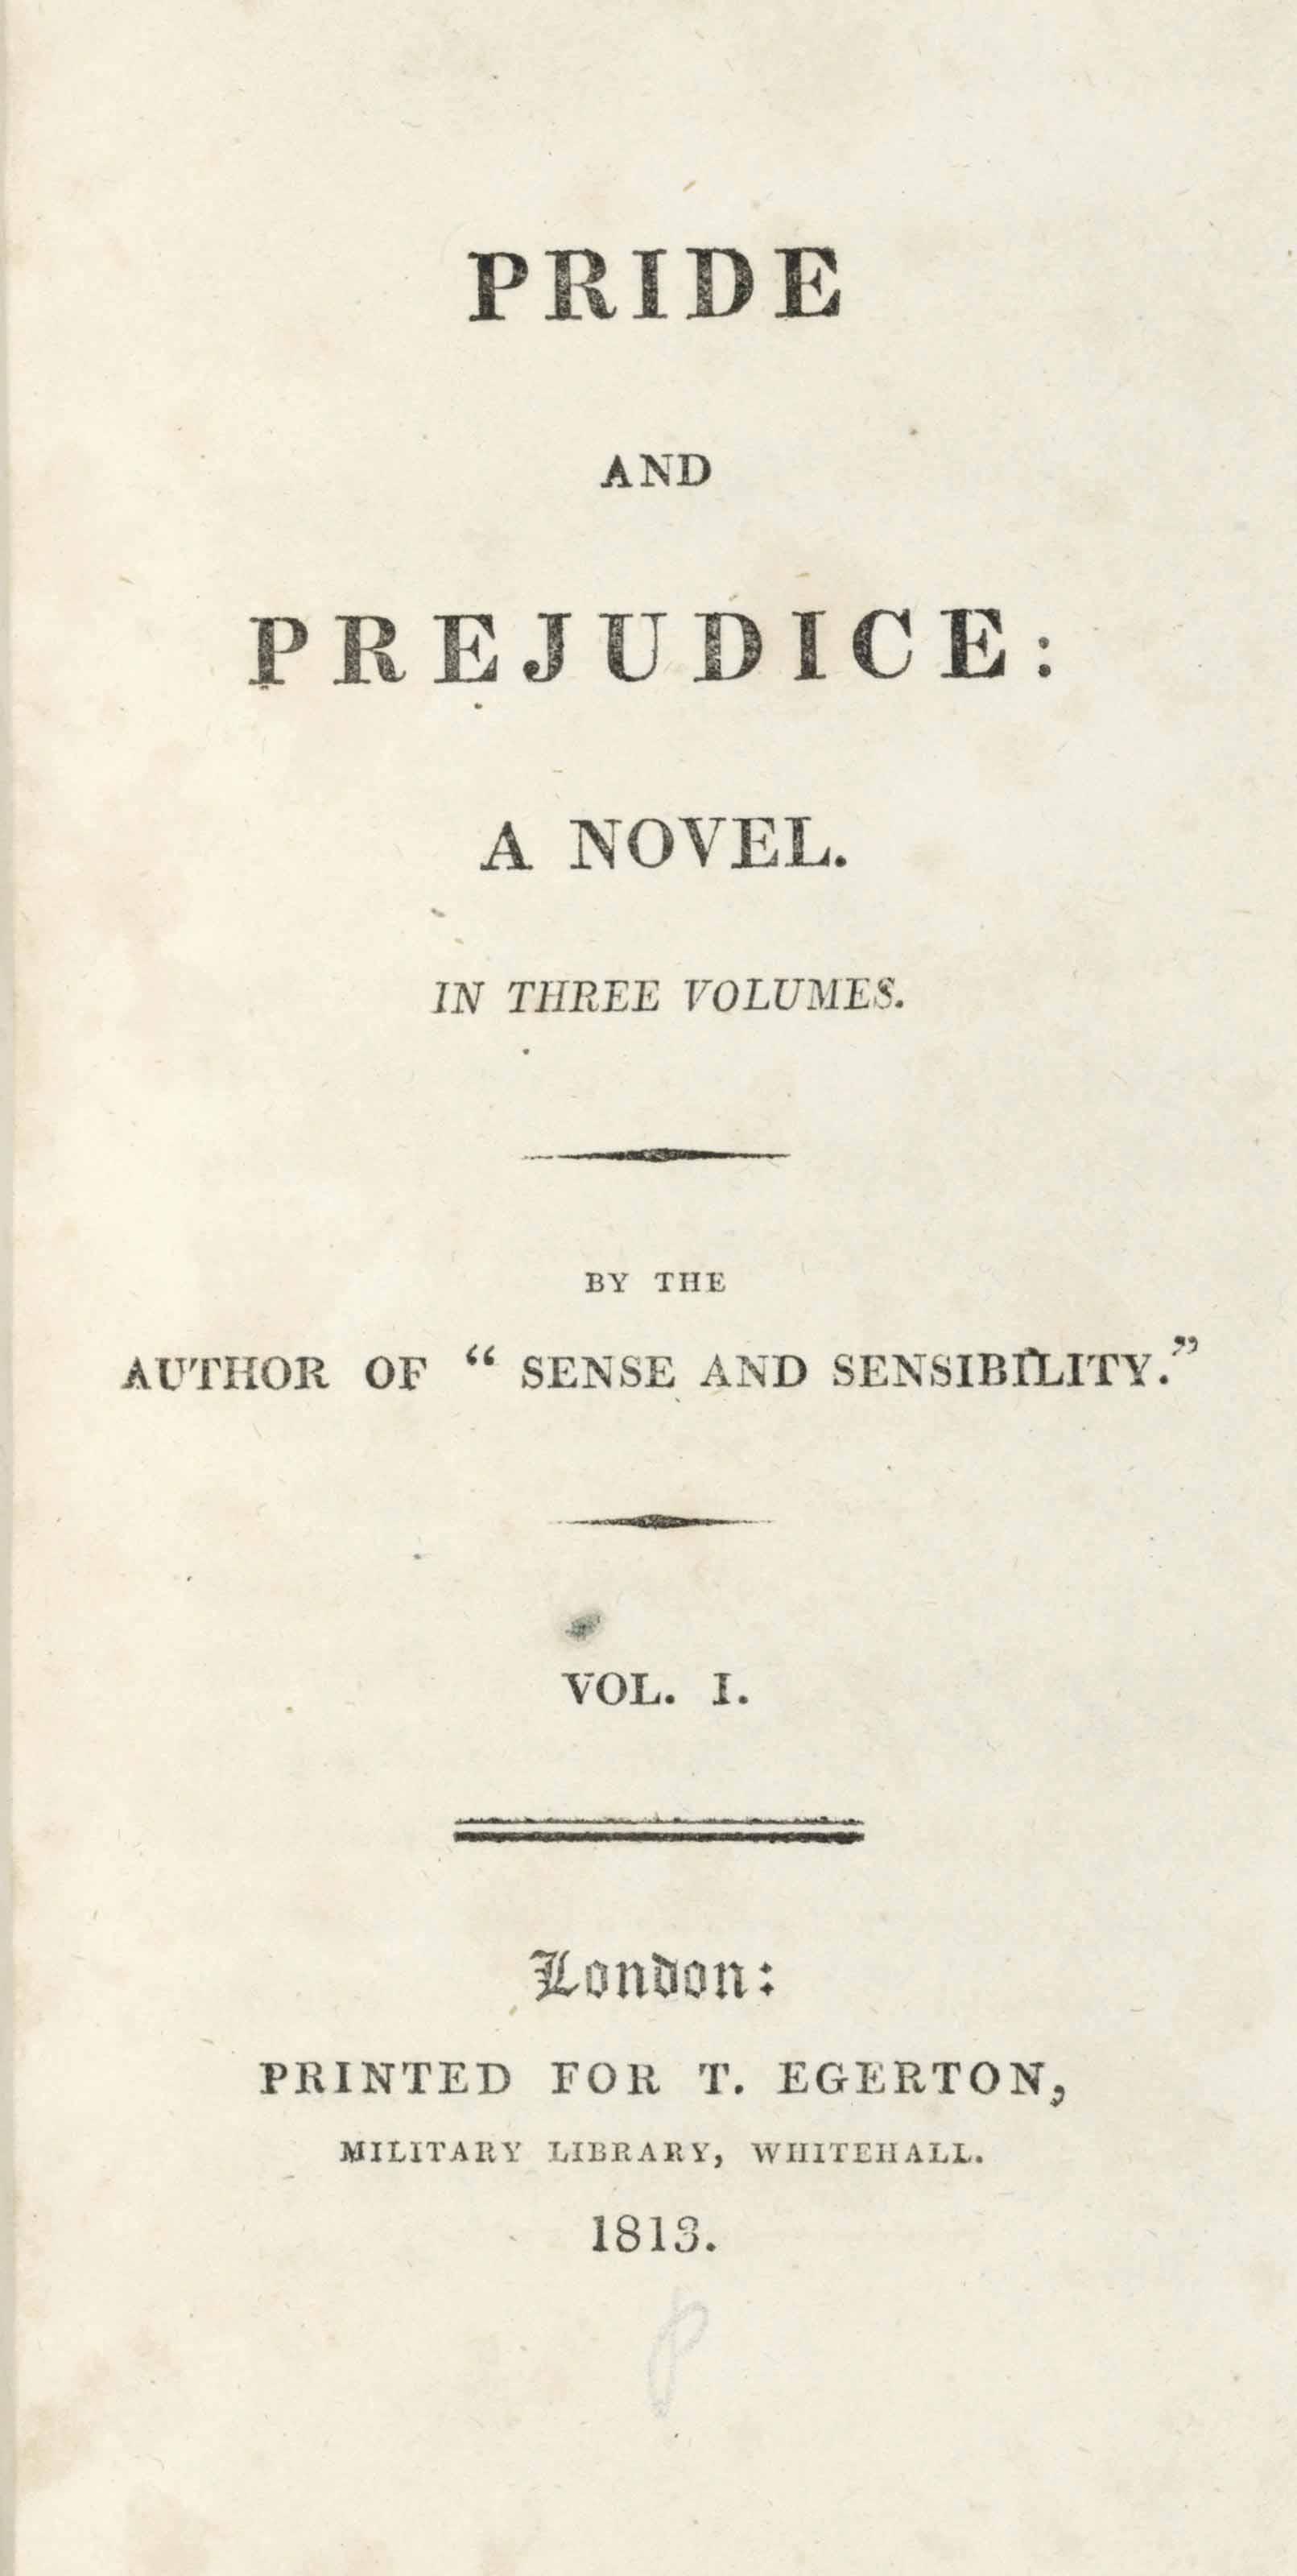 [AUSTEN, Jane]. Pride and Prejudice. London: Printed for T. Egerton, 1813.